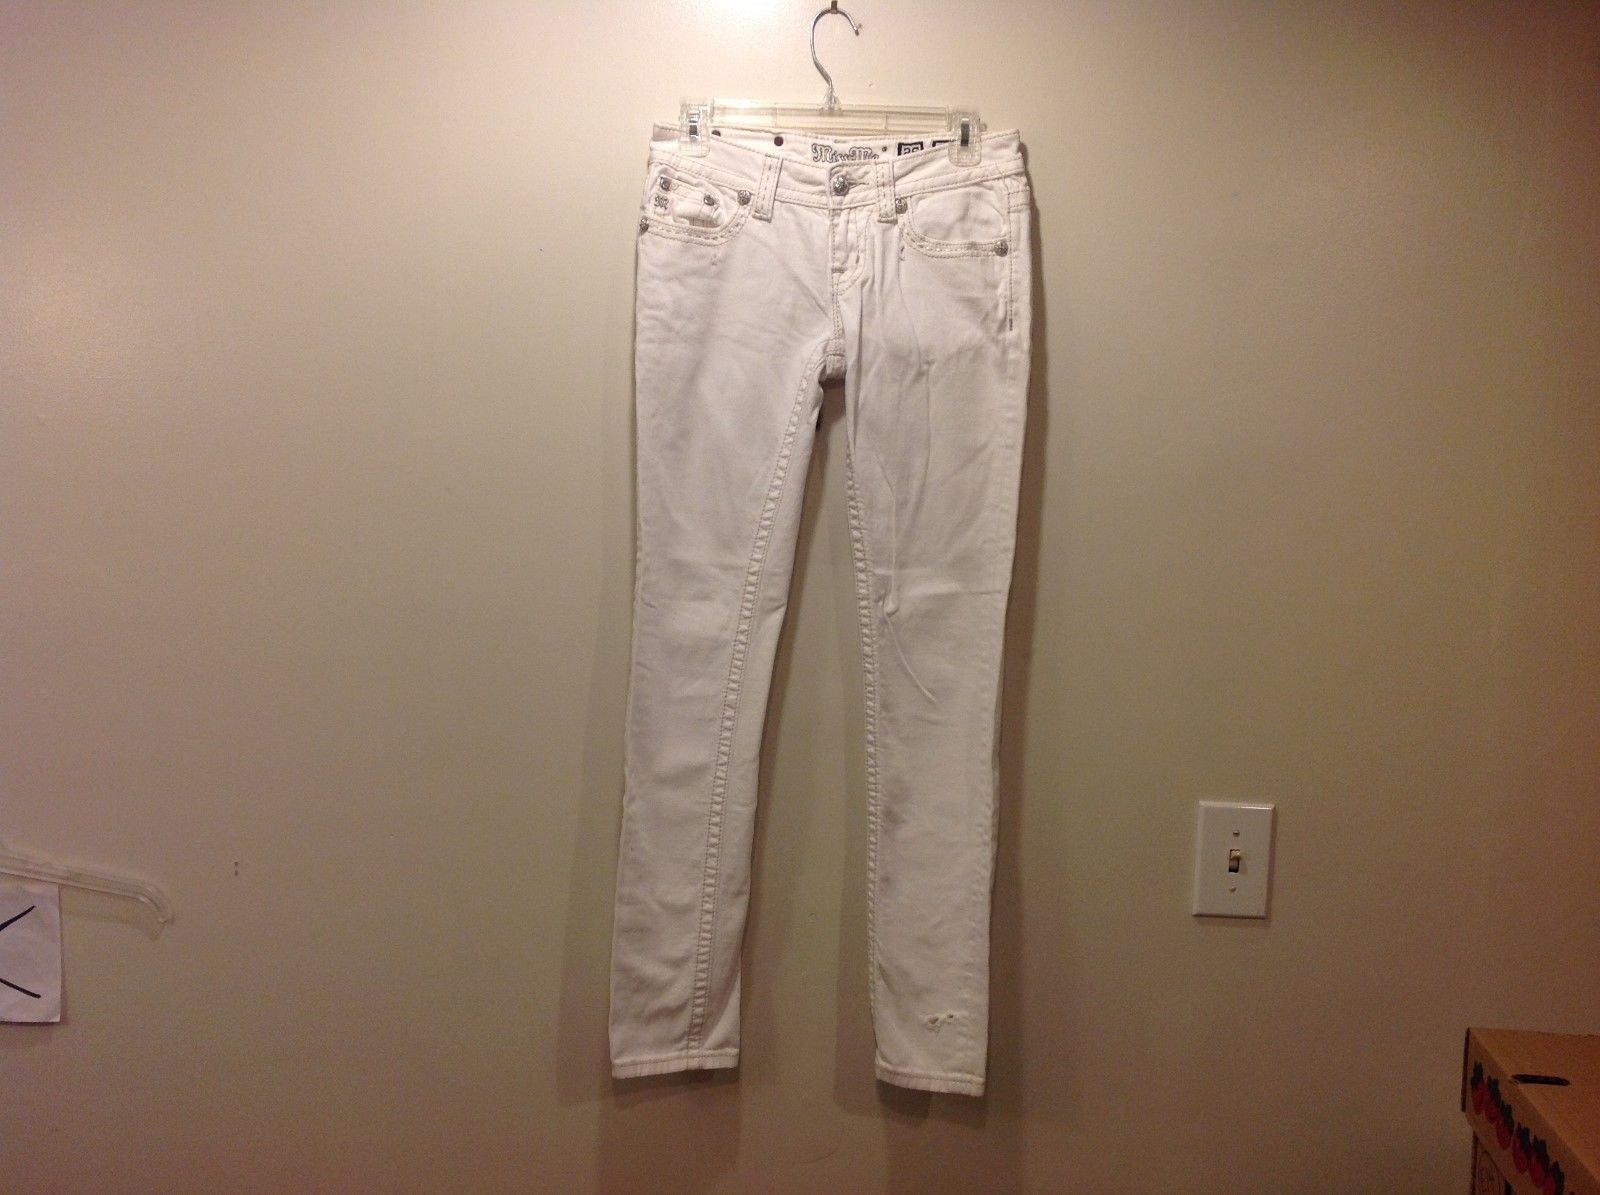 Miss Me Clean White Rockstar Rhinestone Studded Skinny Jeans Sz 26